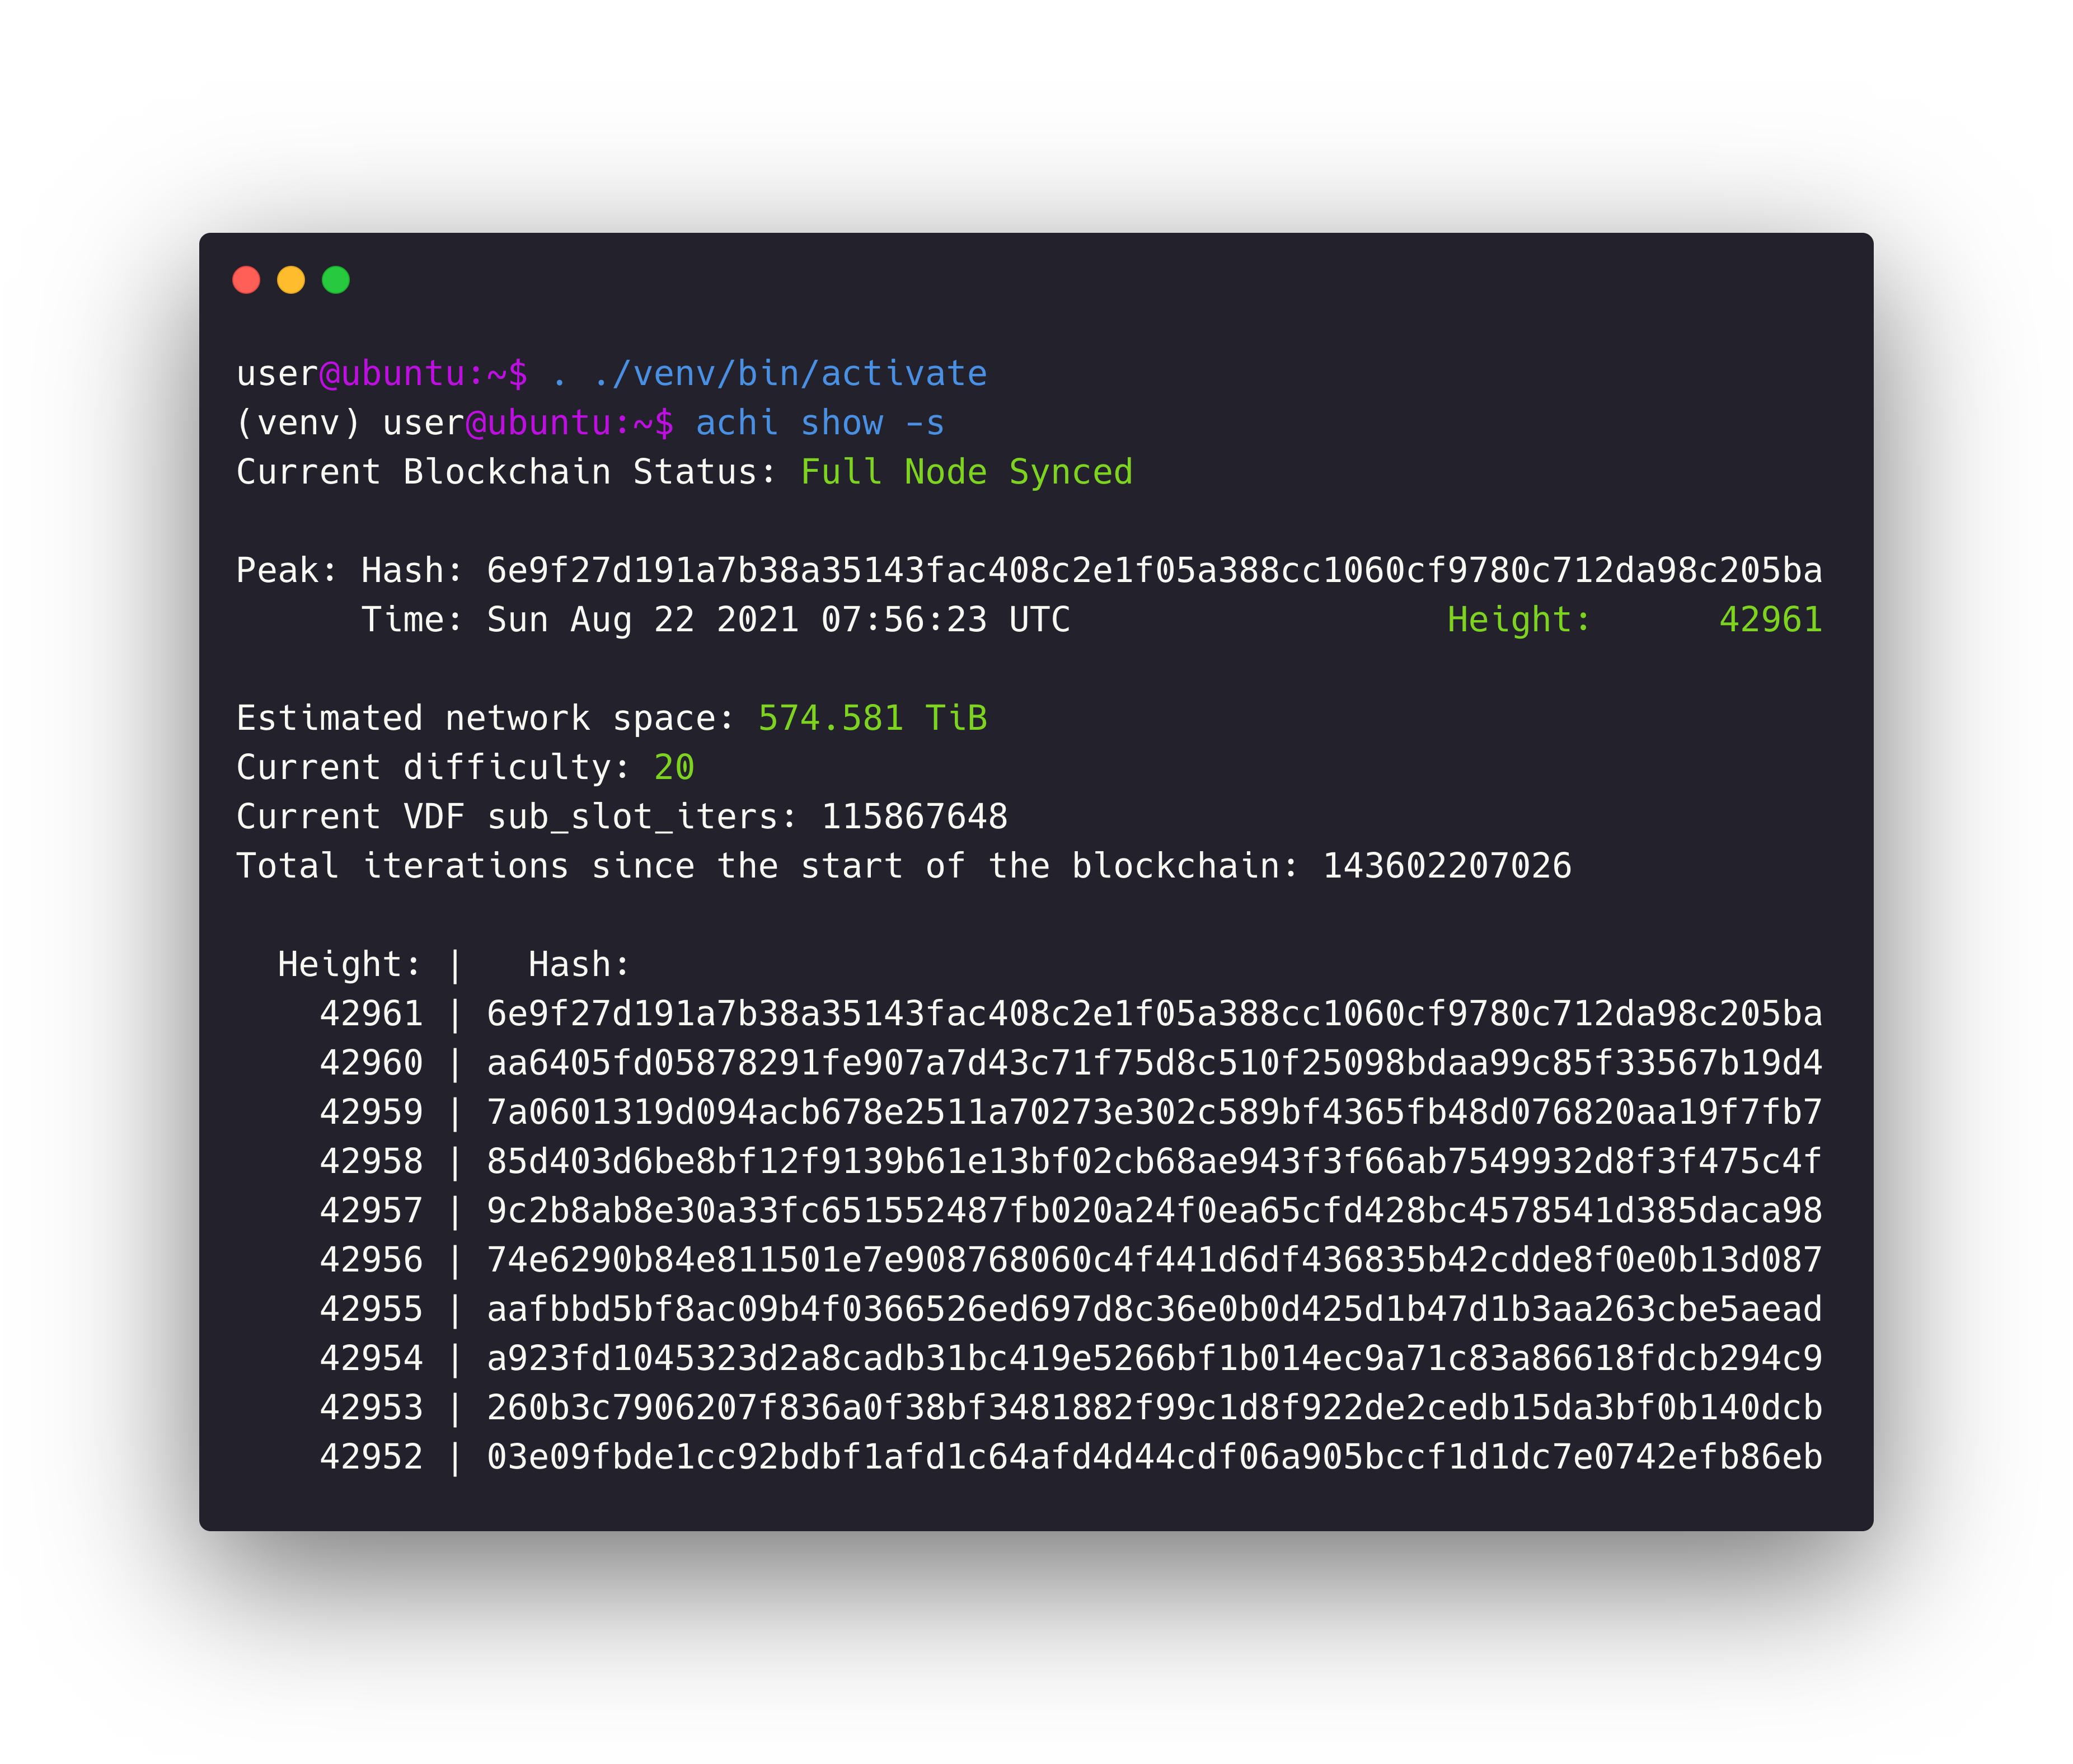 How to check full node status?